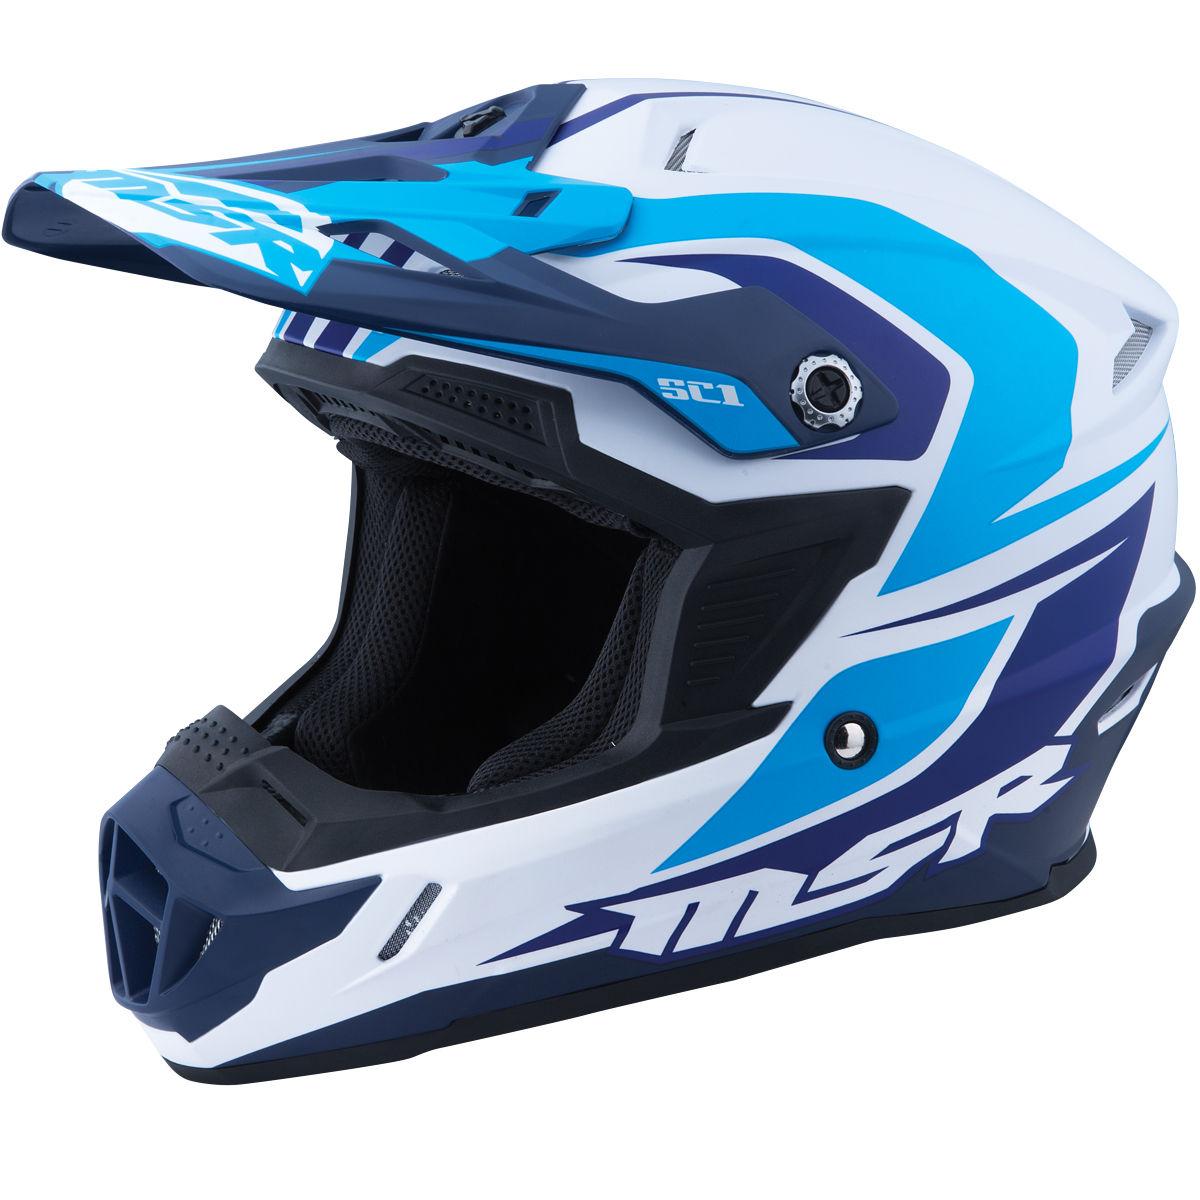 SC1 Score Helmet